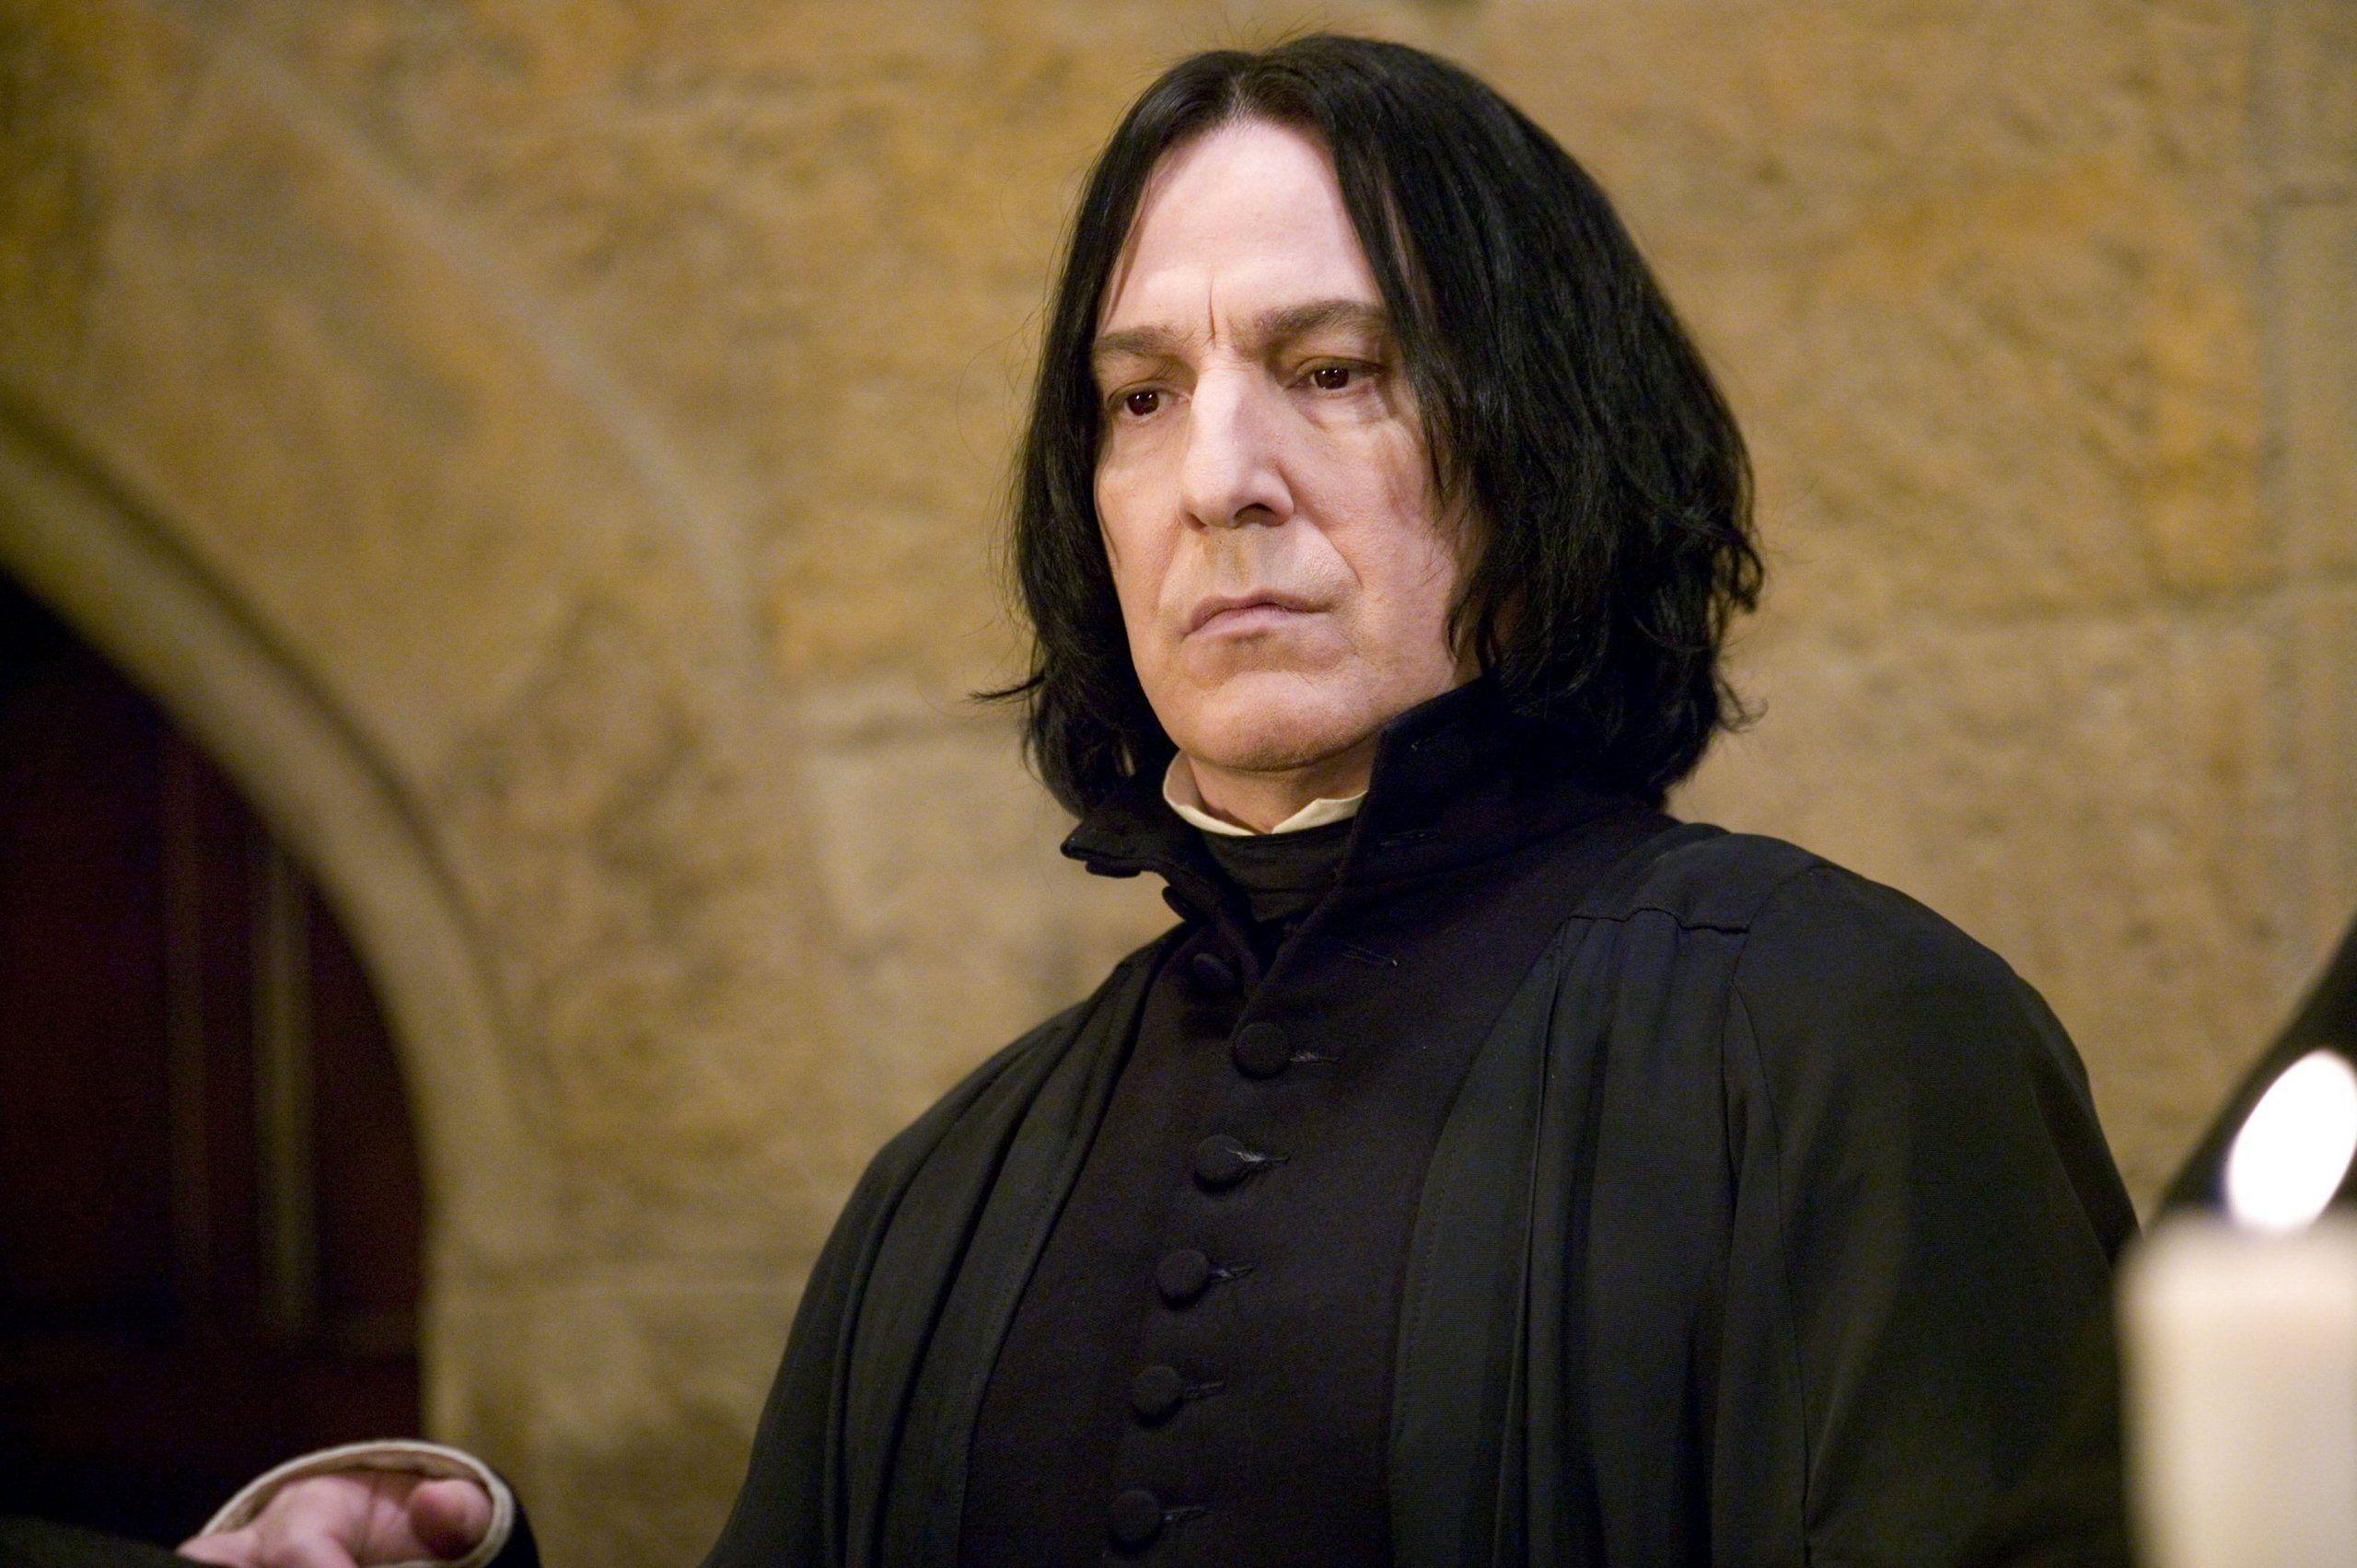 Severus Snape Professores Harry Potter Personagens Harry Potter Snape De Harry Potter